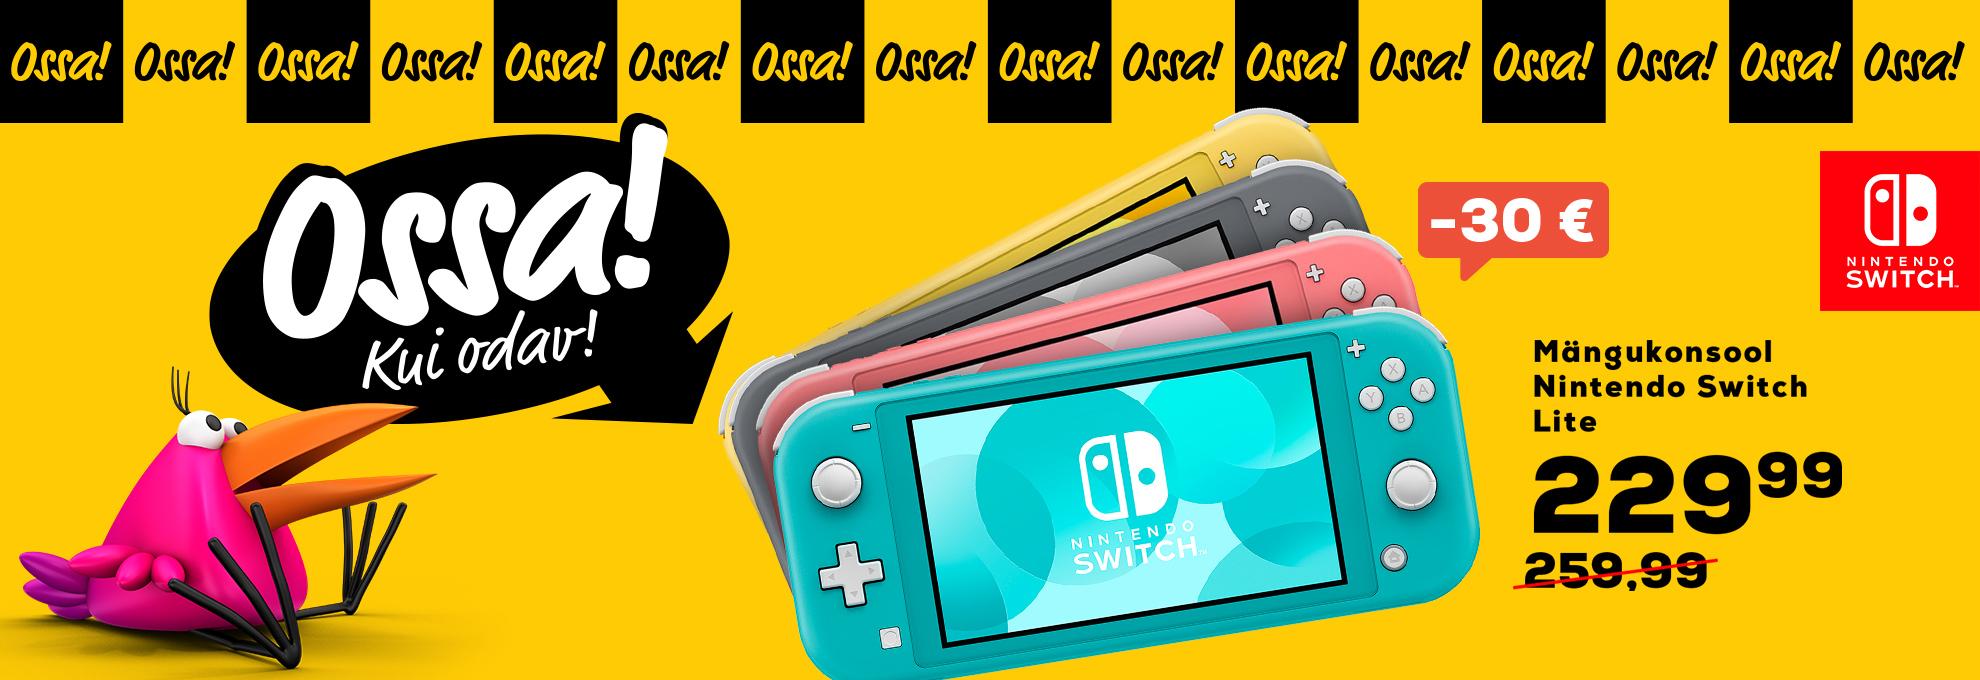 Ossa kui Odav! Nintendo Switch